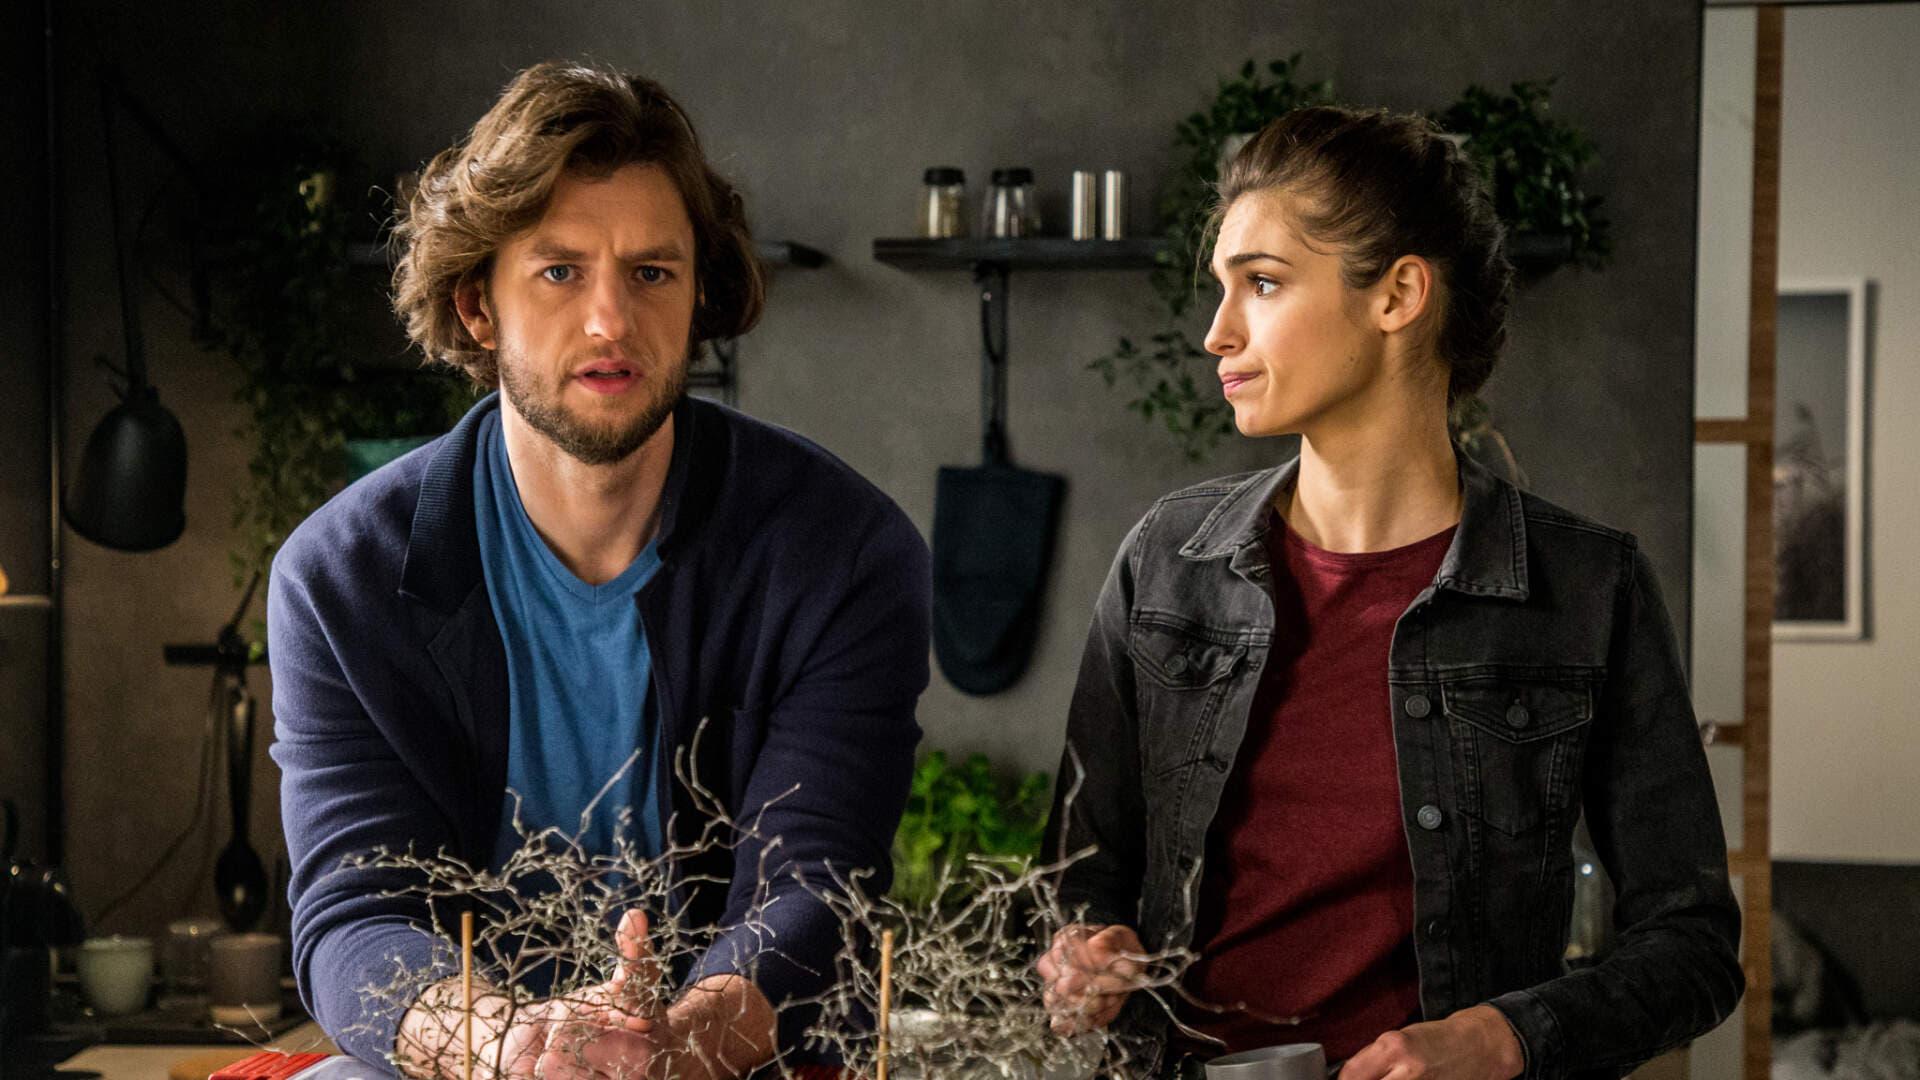 Zakochani po uszy - Season 5 Episode 41 : Episode 41